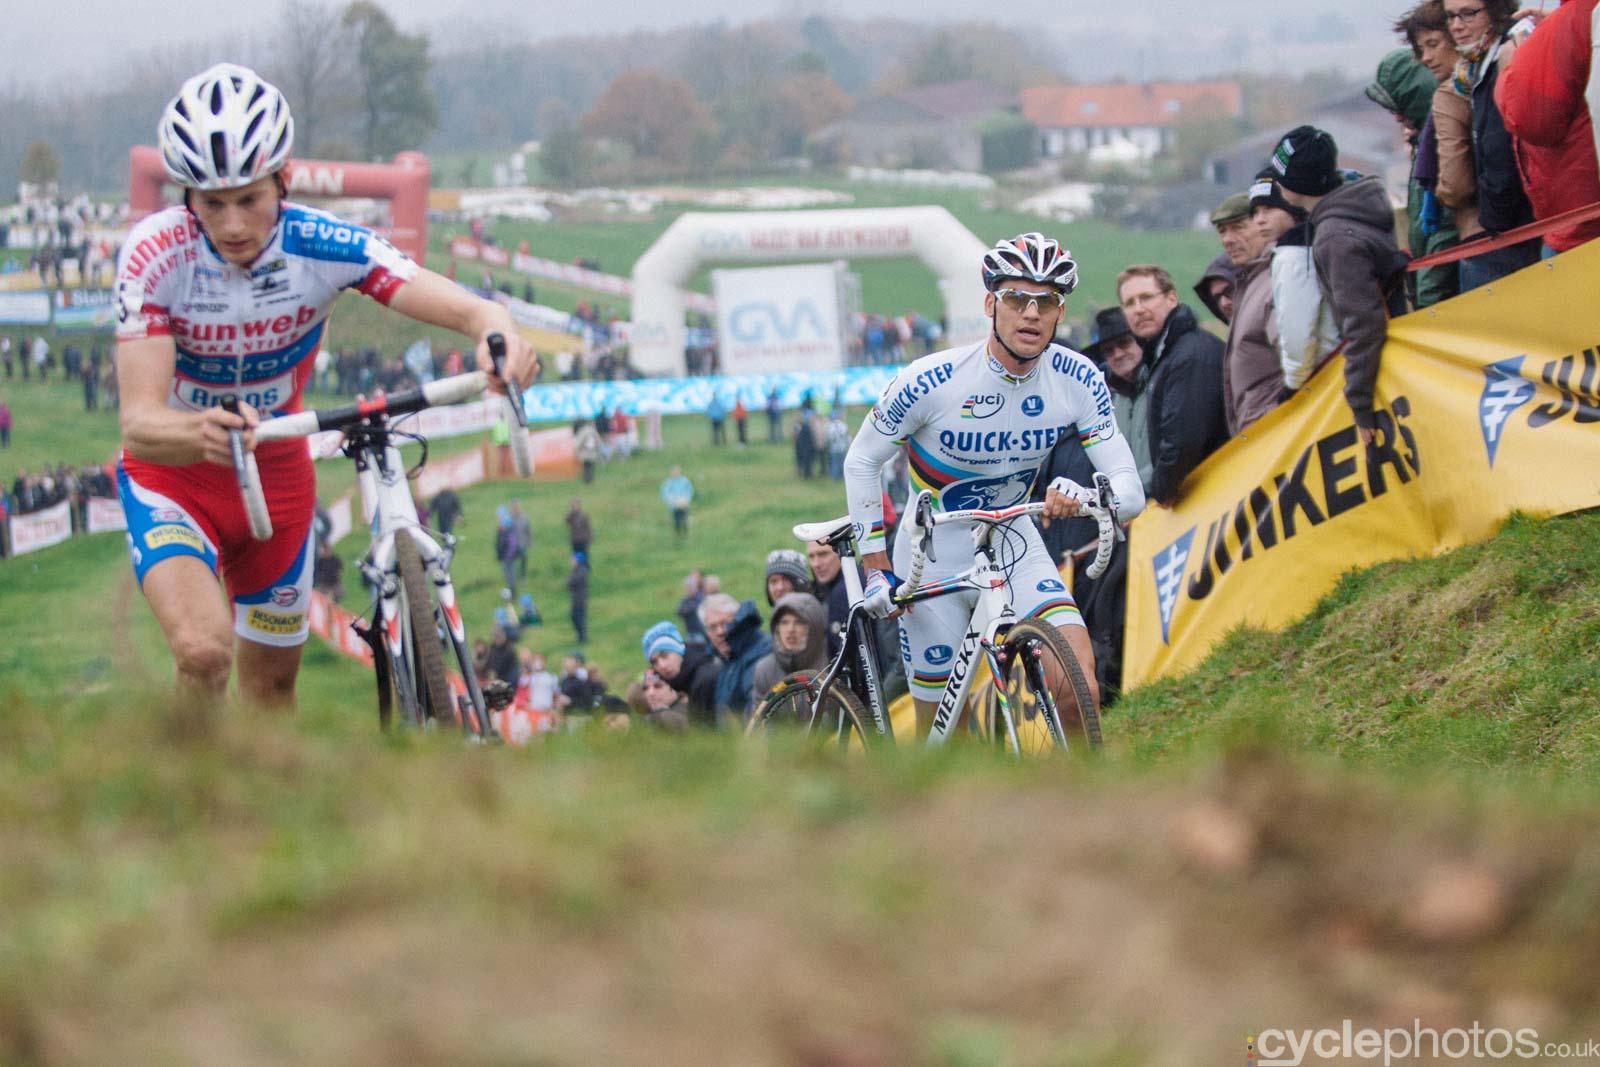 2015-cyclephotos-cyclocross-ronse-155304-zdenek-stybar